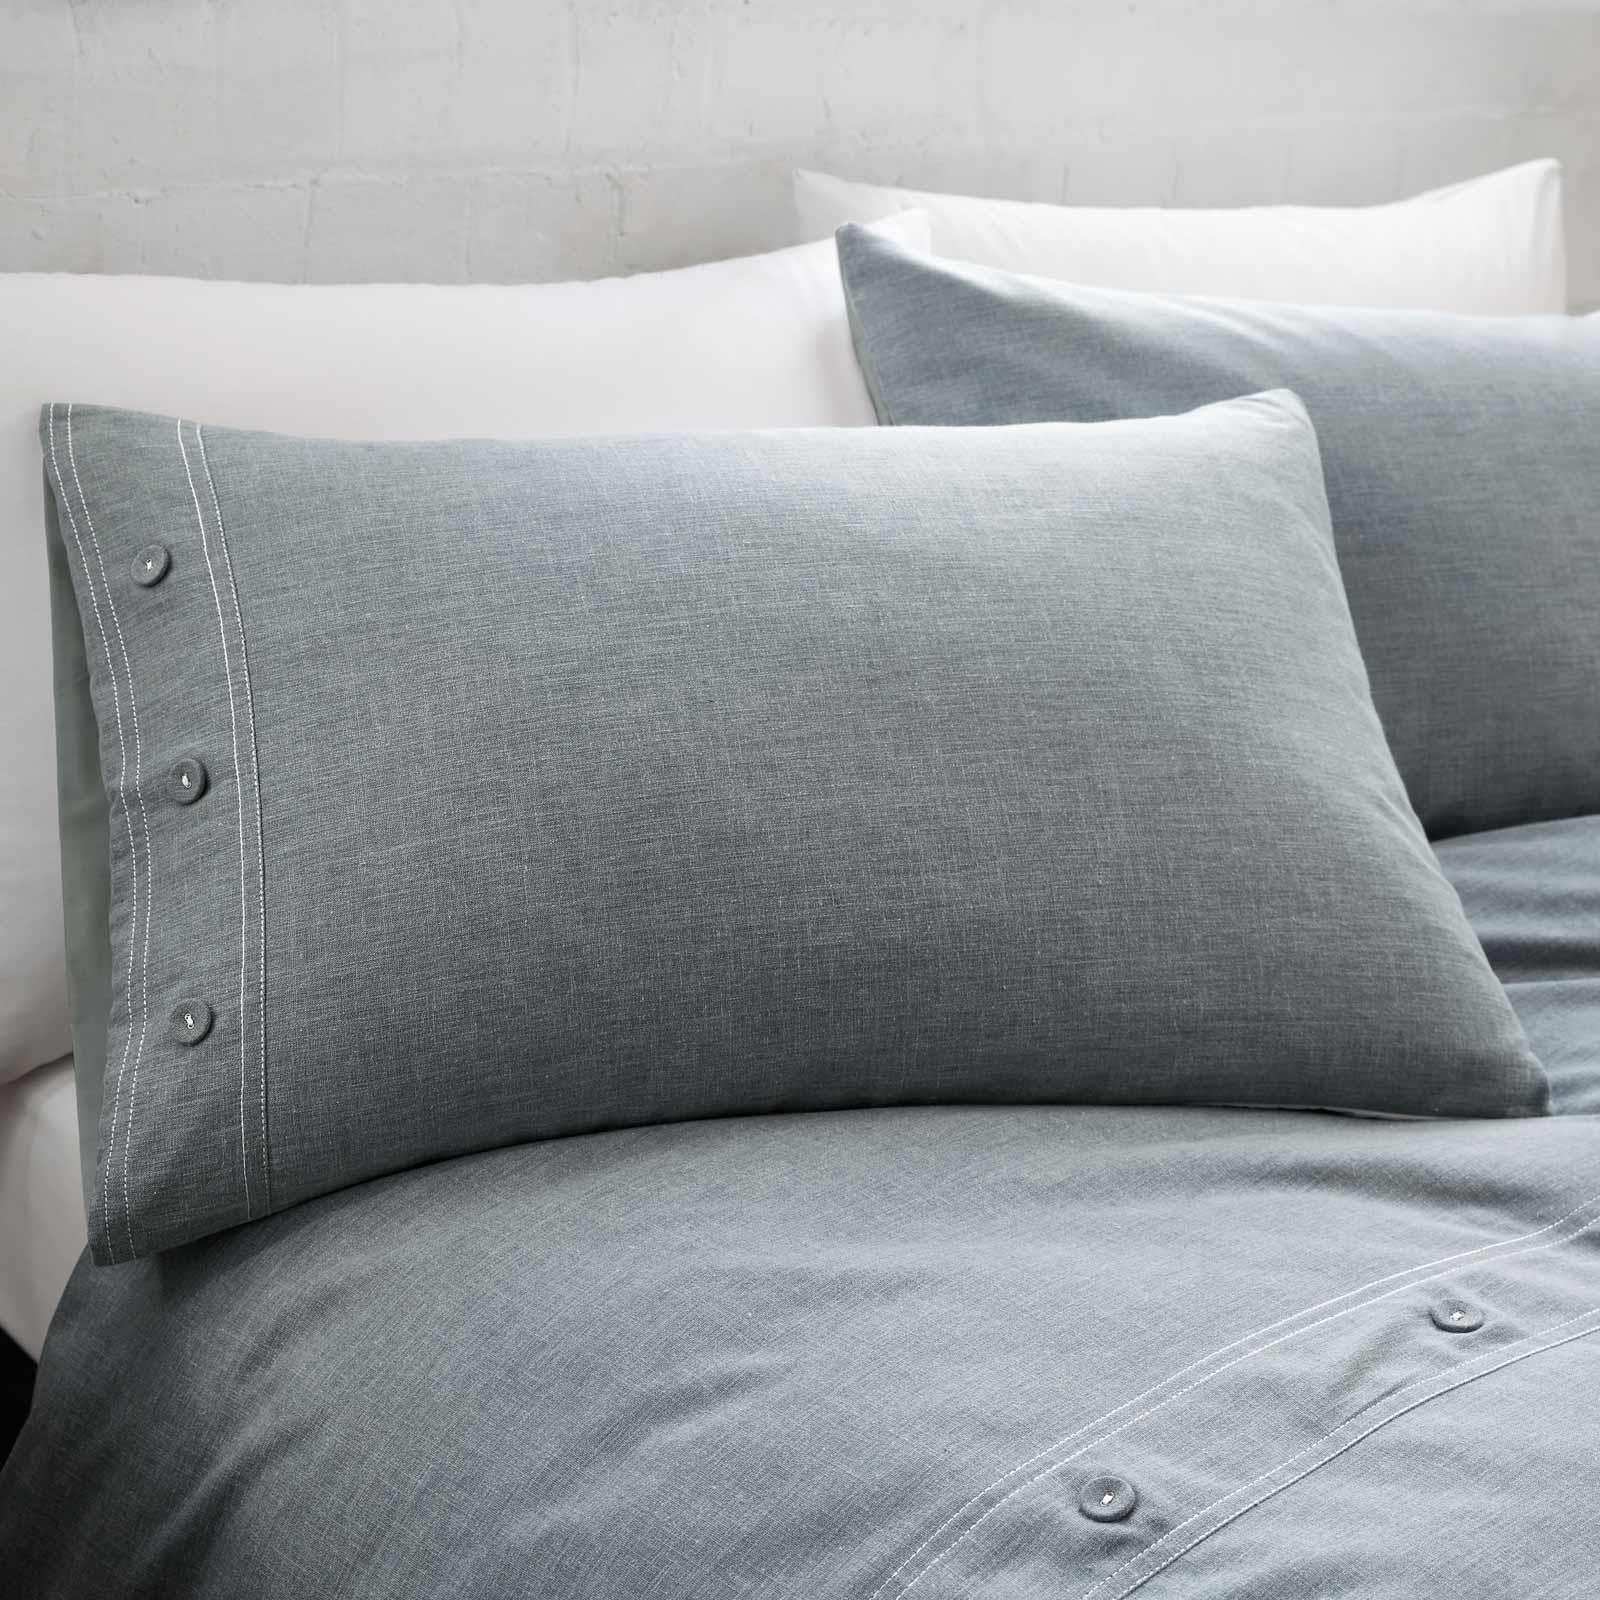 Azul-fundas-nordicas-Denim-Chambray-Boton-Detalle-de-lujo-cubierta-del-edredon-conjuntos-de-cama miniatura 6